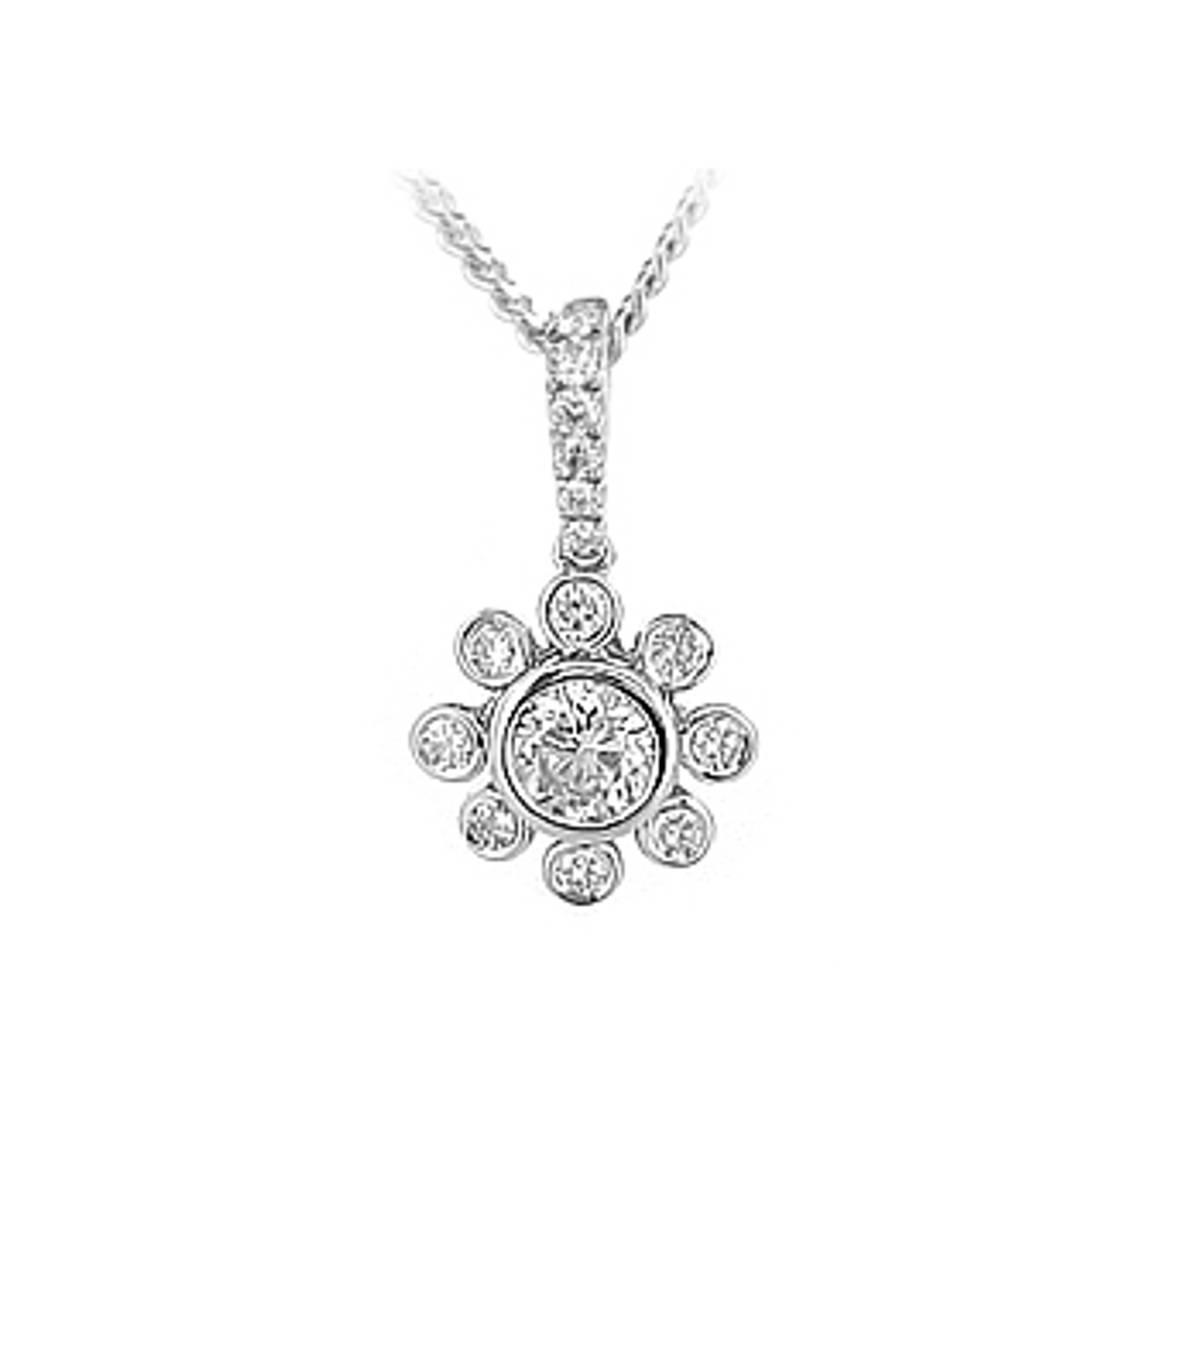 "18k white gold brilliant cut diamond rubover set  pendant on 18k white gold 18"" chain DETAILS Carat: total diamond weight 0.53cts   Pendant length 1.7cmPendant width 1cm"